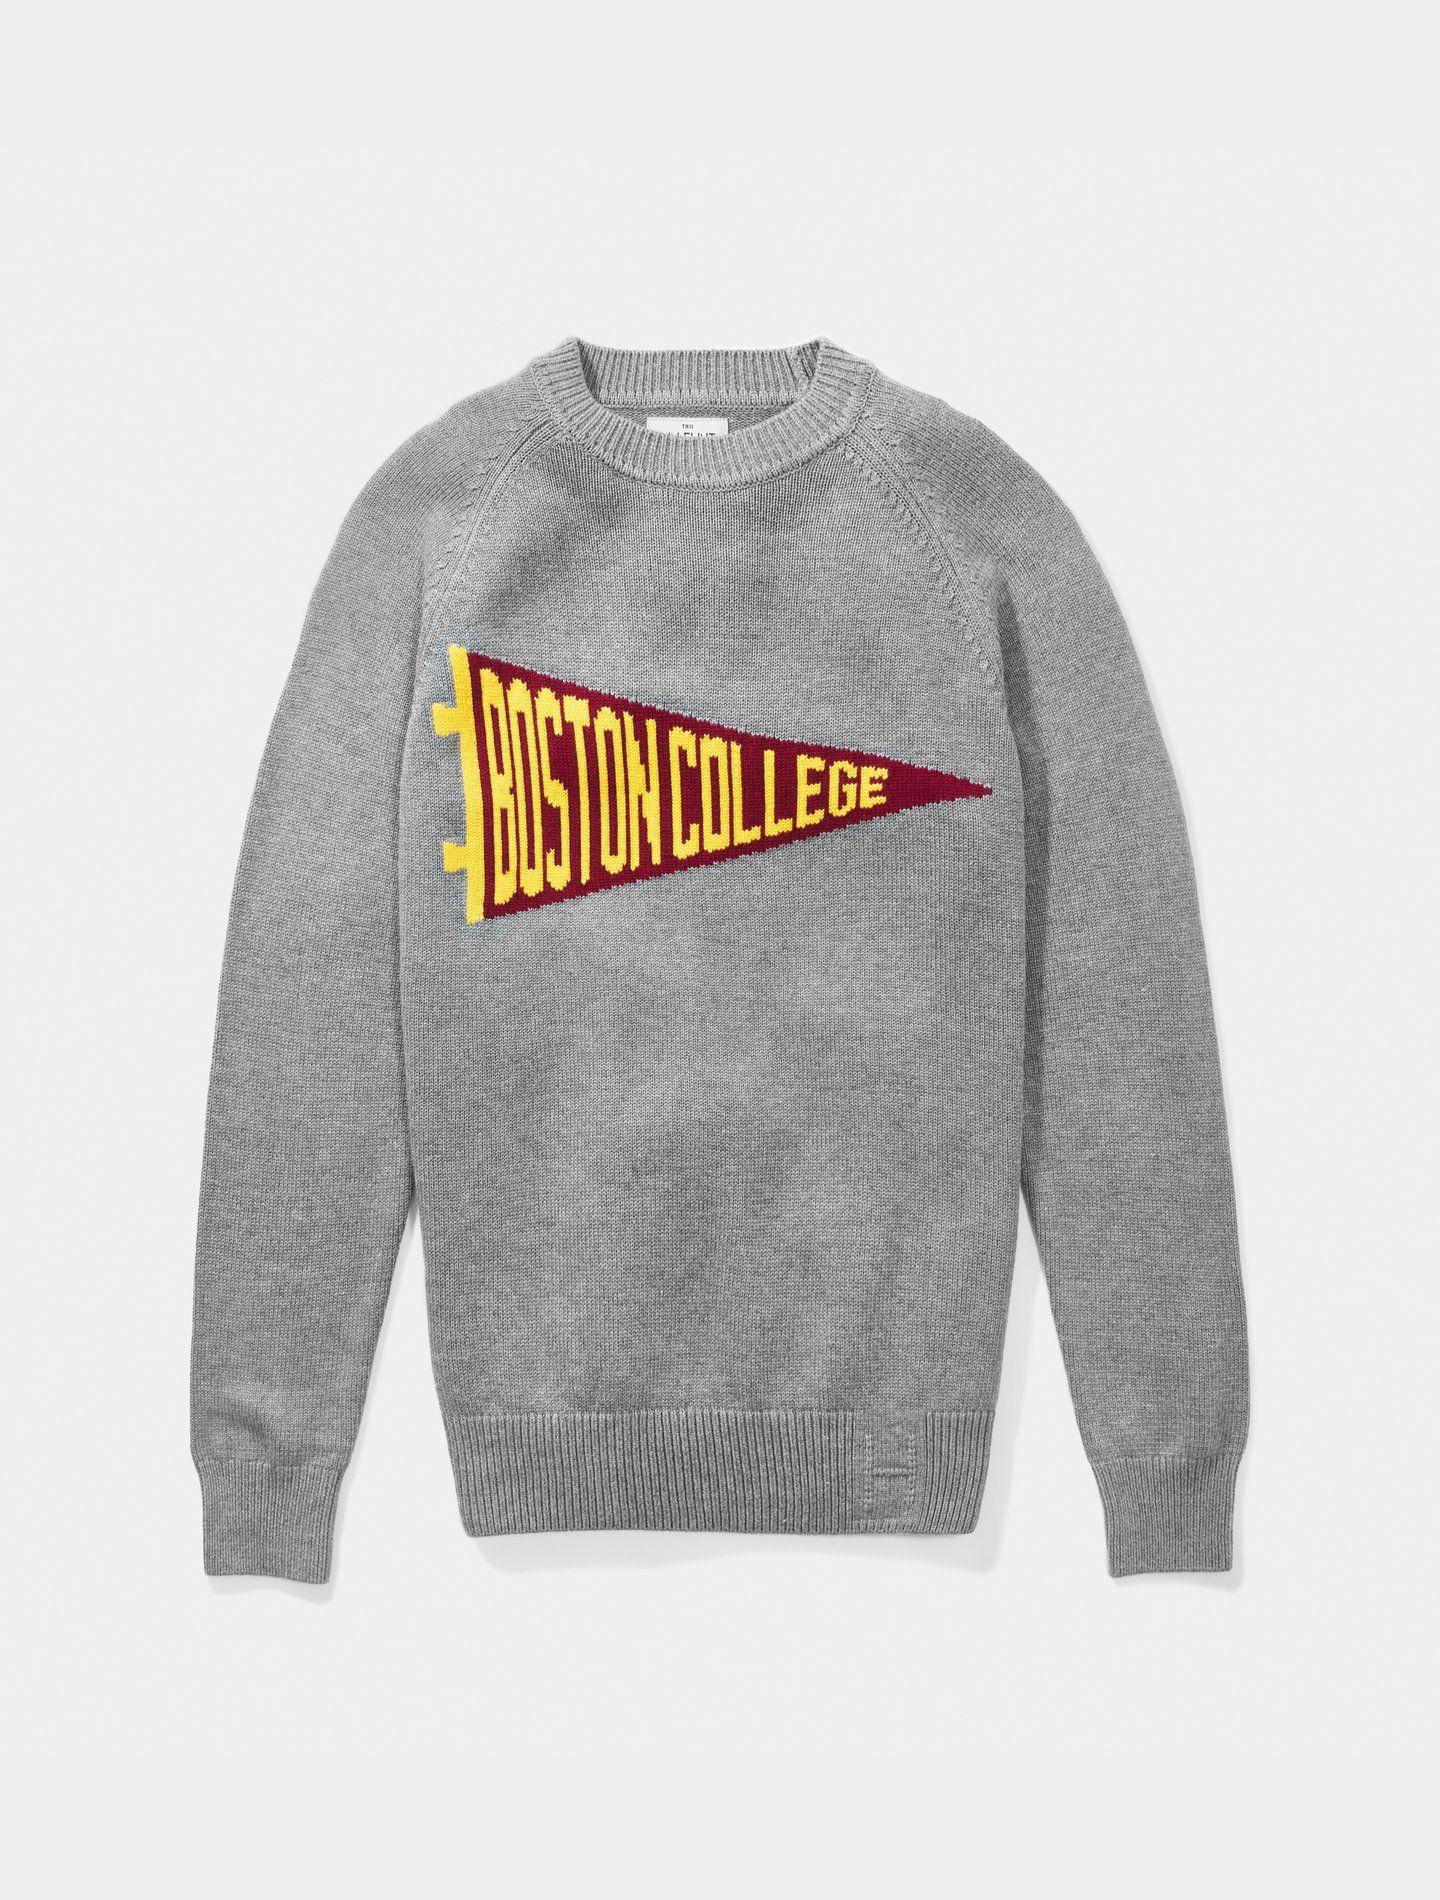 Boston College Pennant Sweater In 2021 College Shirt Design Vintage College Sweatshirts School Shirt Designs [ 1900 x 1440 Pixel ]